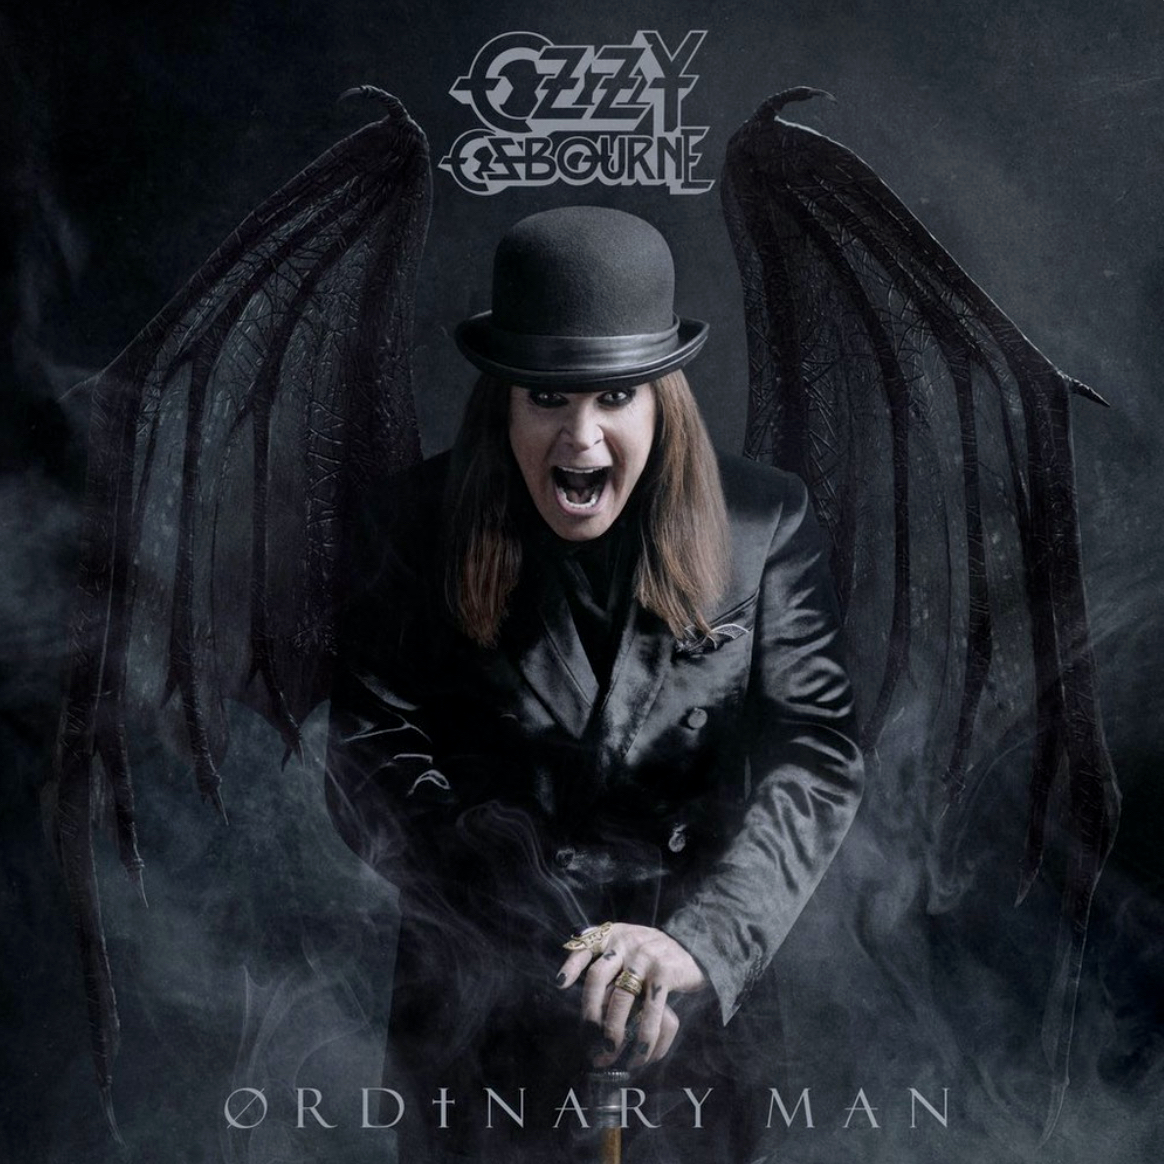 Ozzy Osbourne: Ordinary Man (2020).